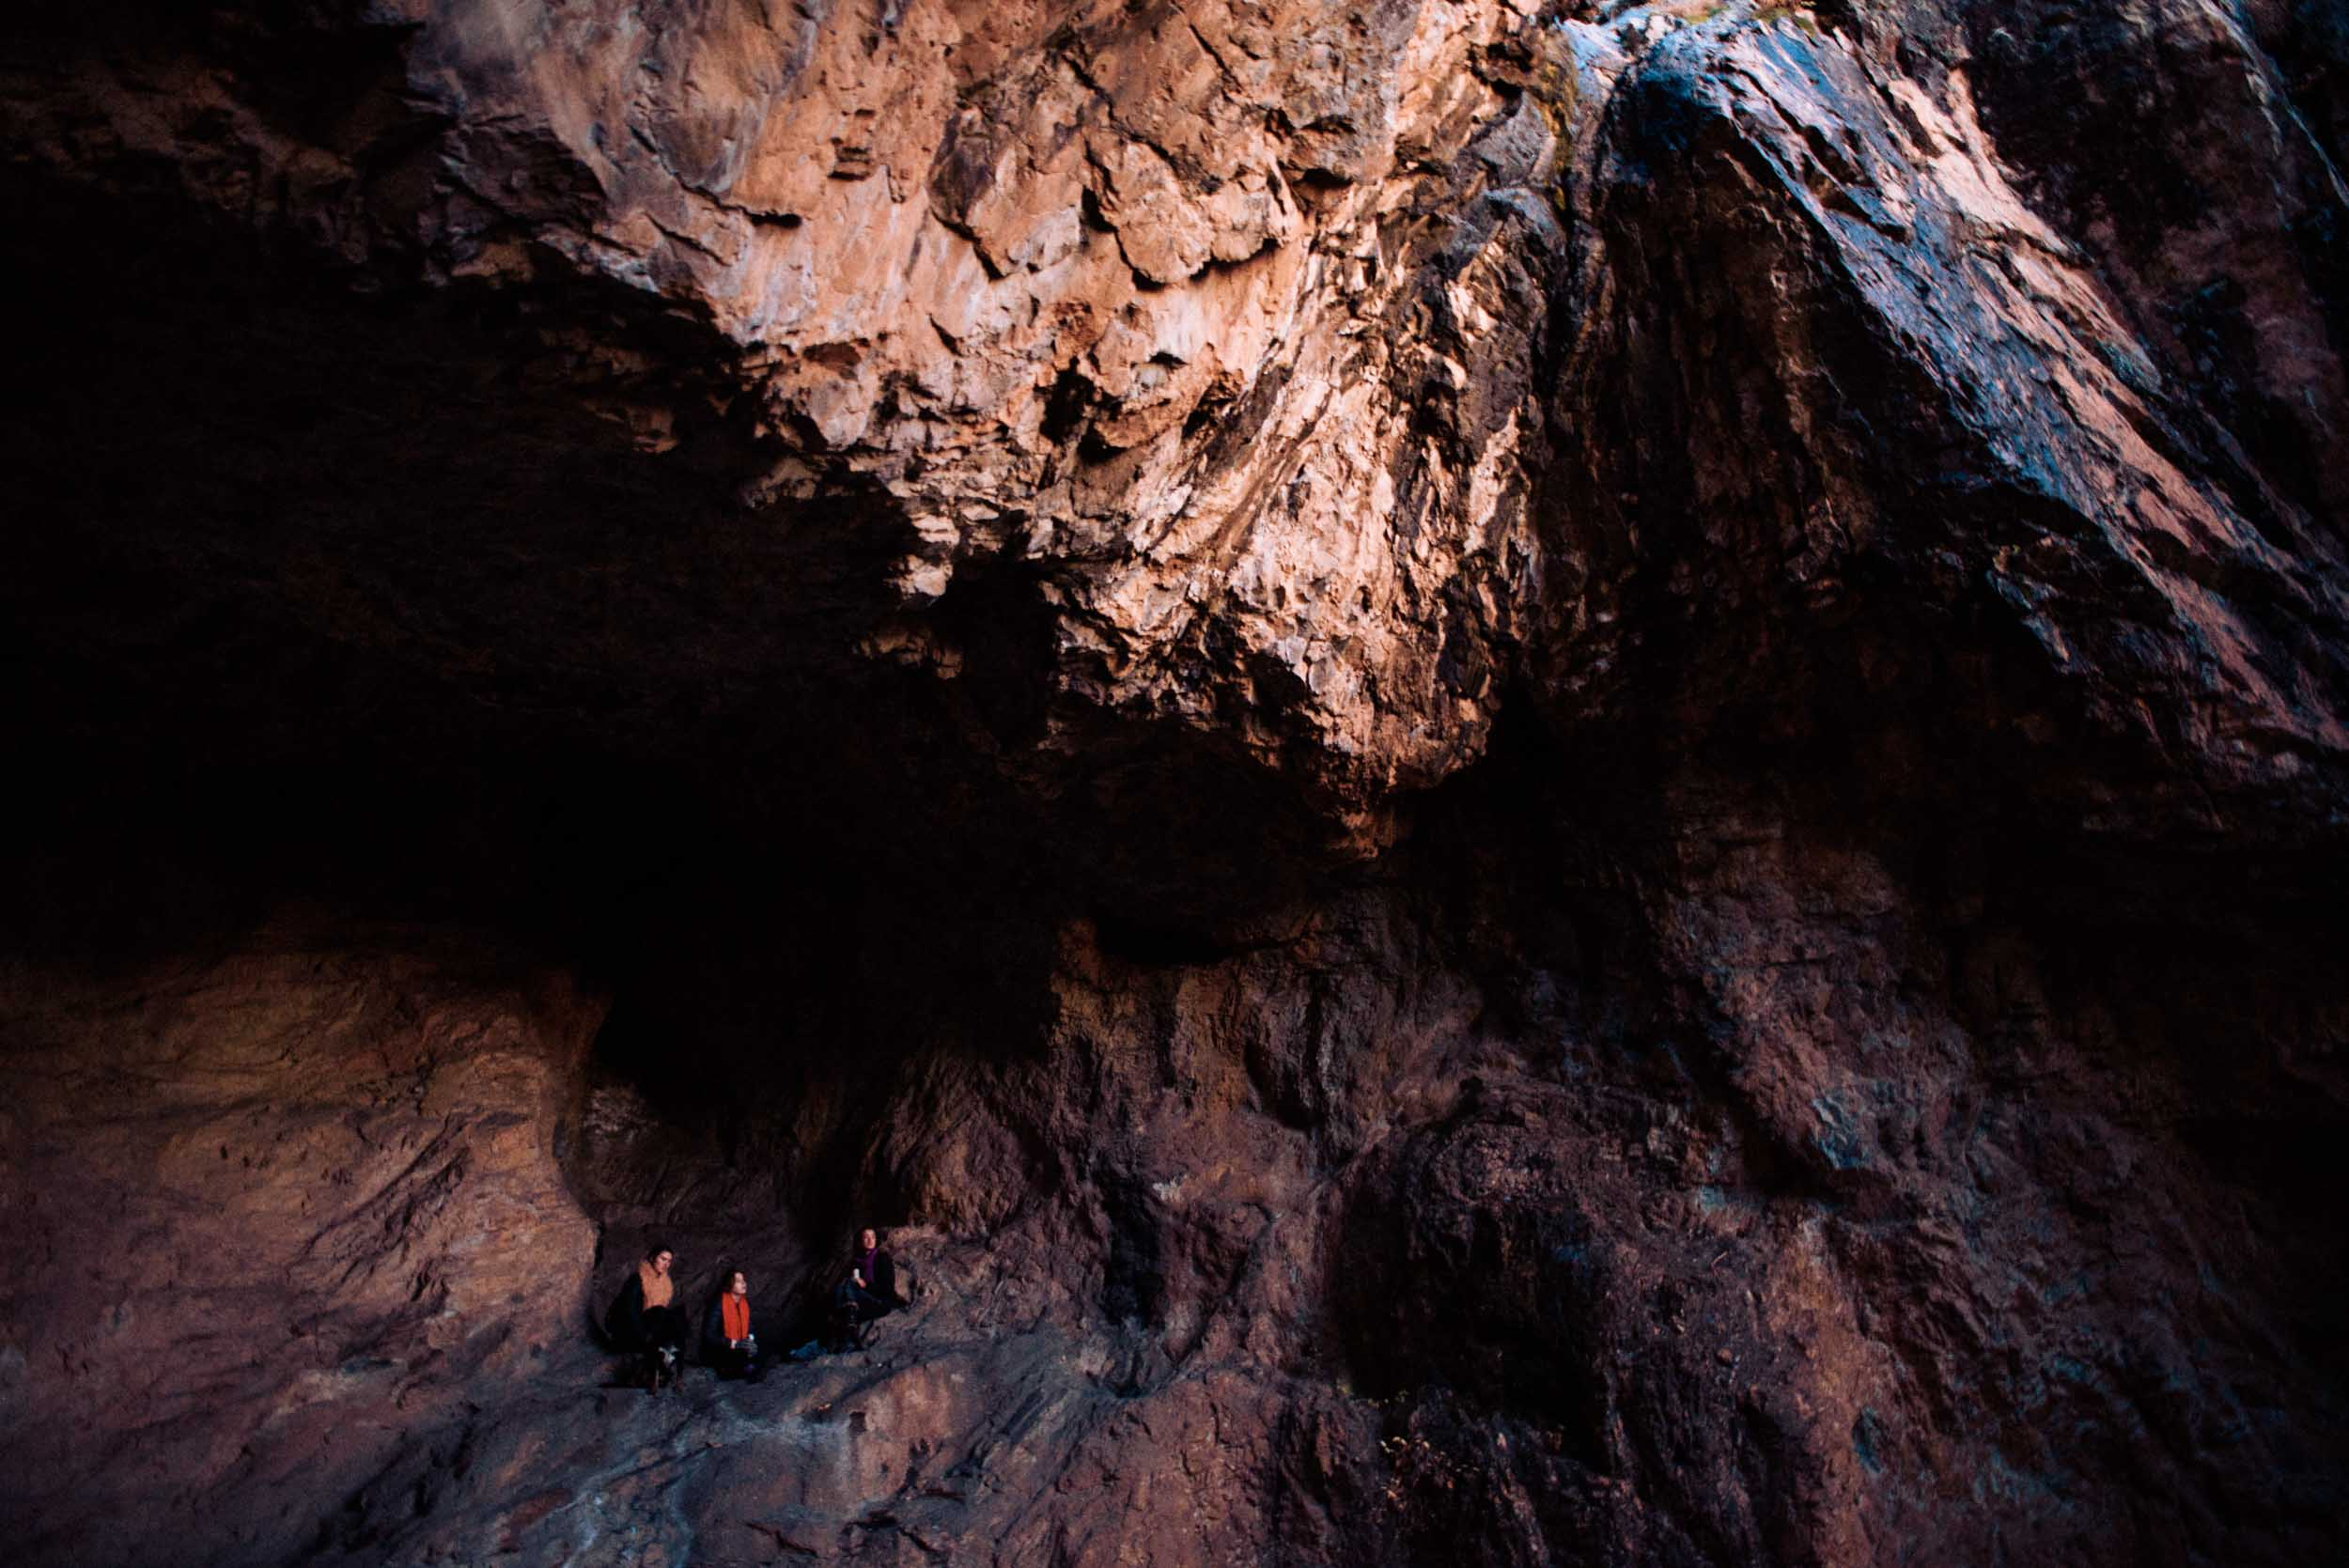 Miriam-Subbiah-Taos-12.jpg